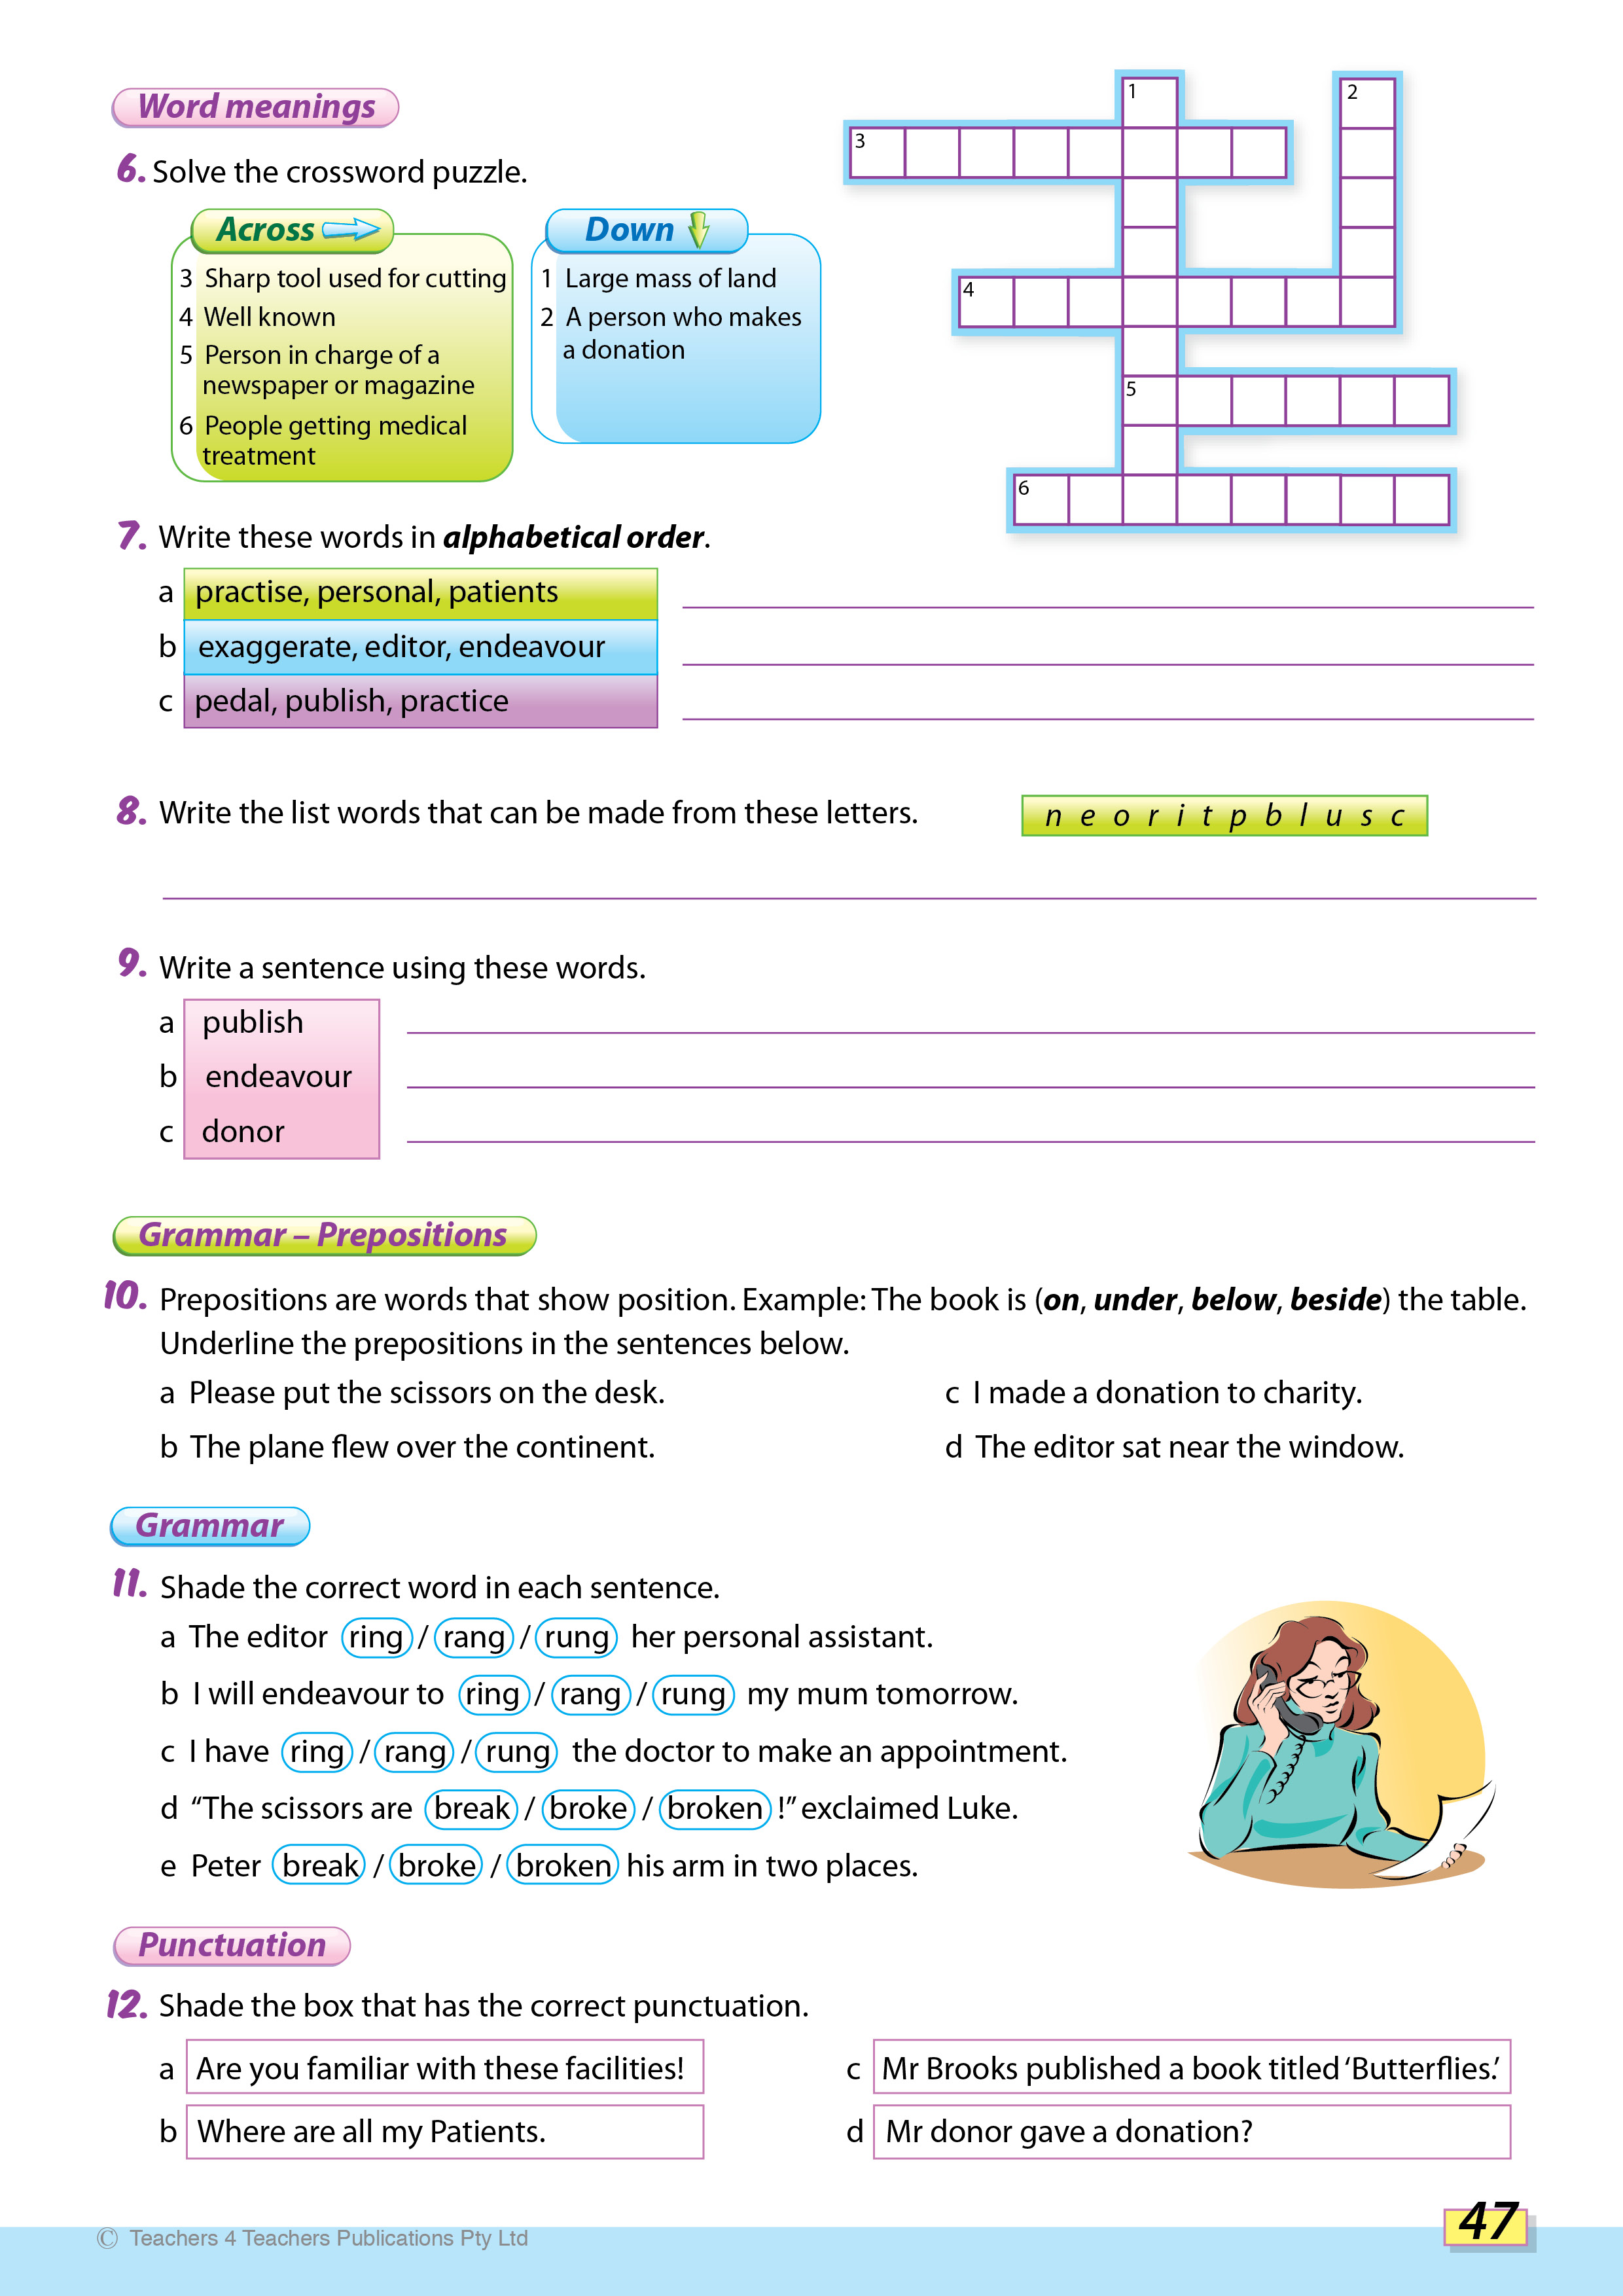 Spelling Conventions - Teachers 4 Teachers Publications Pty Ltd